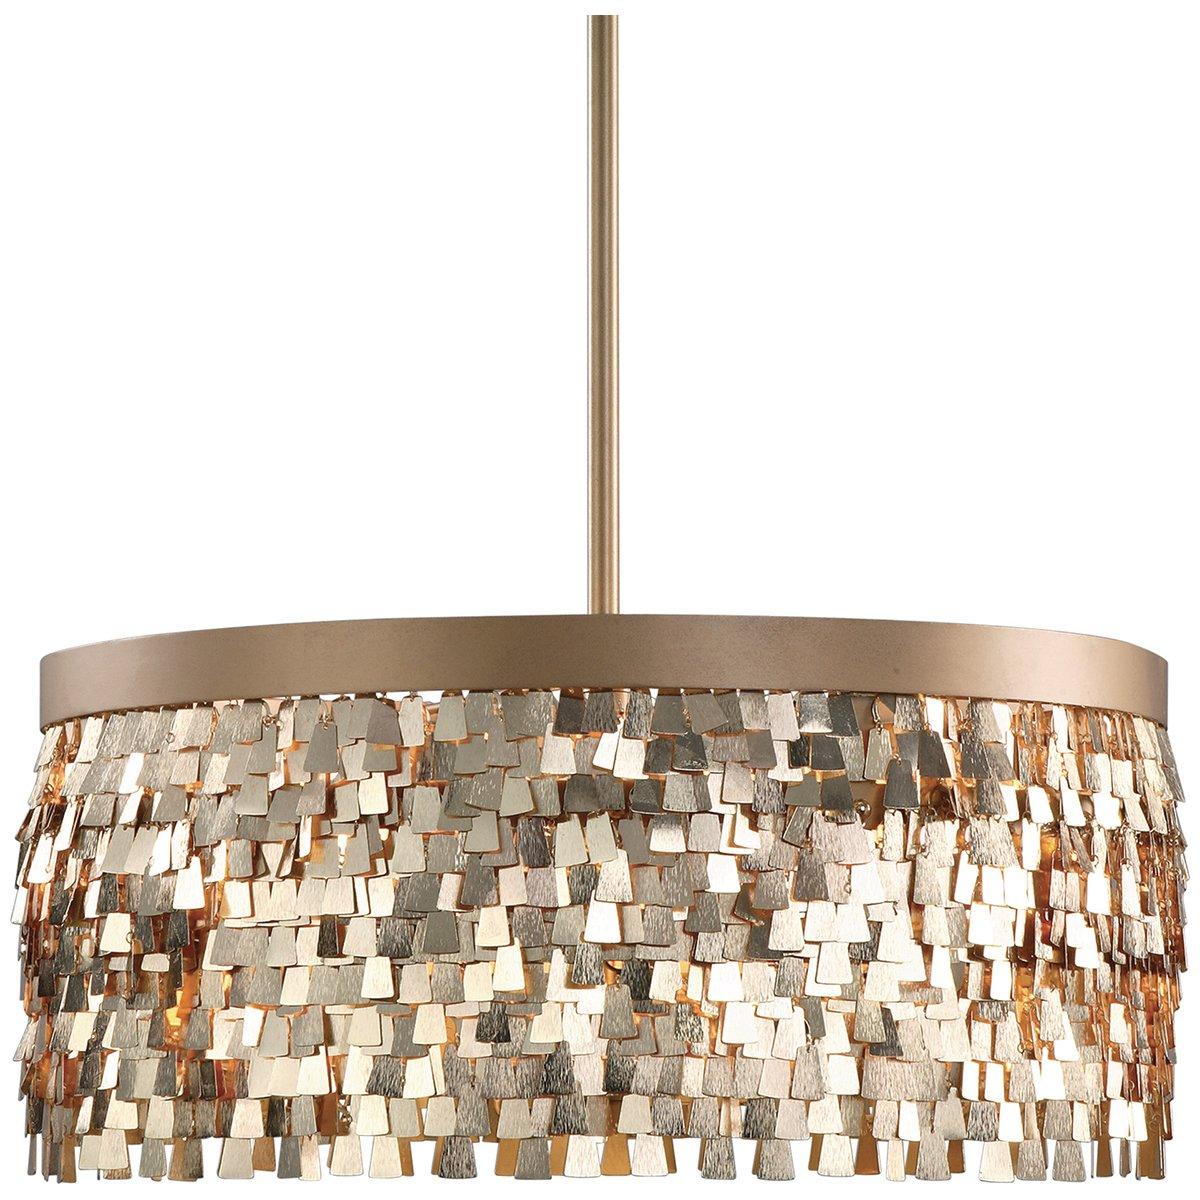 Amazon uttermost 22064 tillie 3 light textured pendant gold amazon uttermost 22064 tillie 3 light textured pendant gold home kitchen aloadofball Choice Image